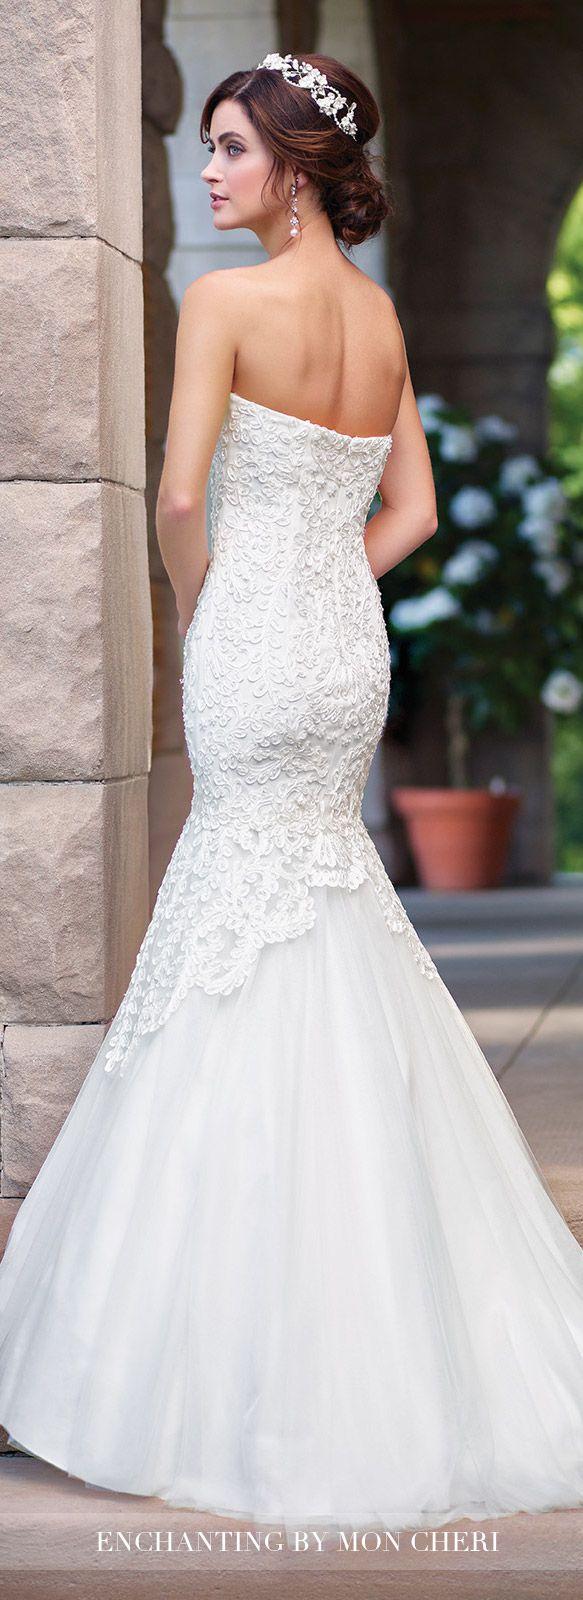 Wedding Dress  - Enchanting by Mon Cheri Bridals 2017